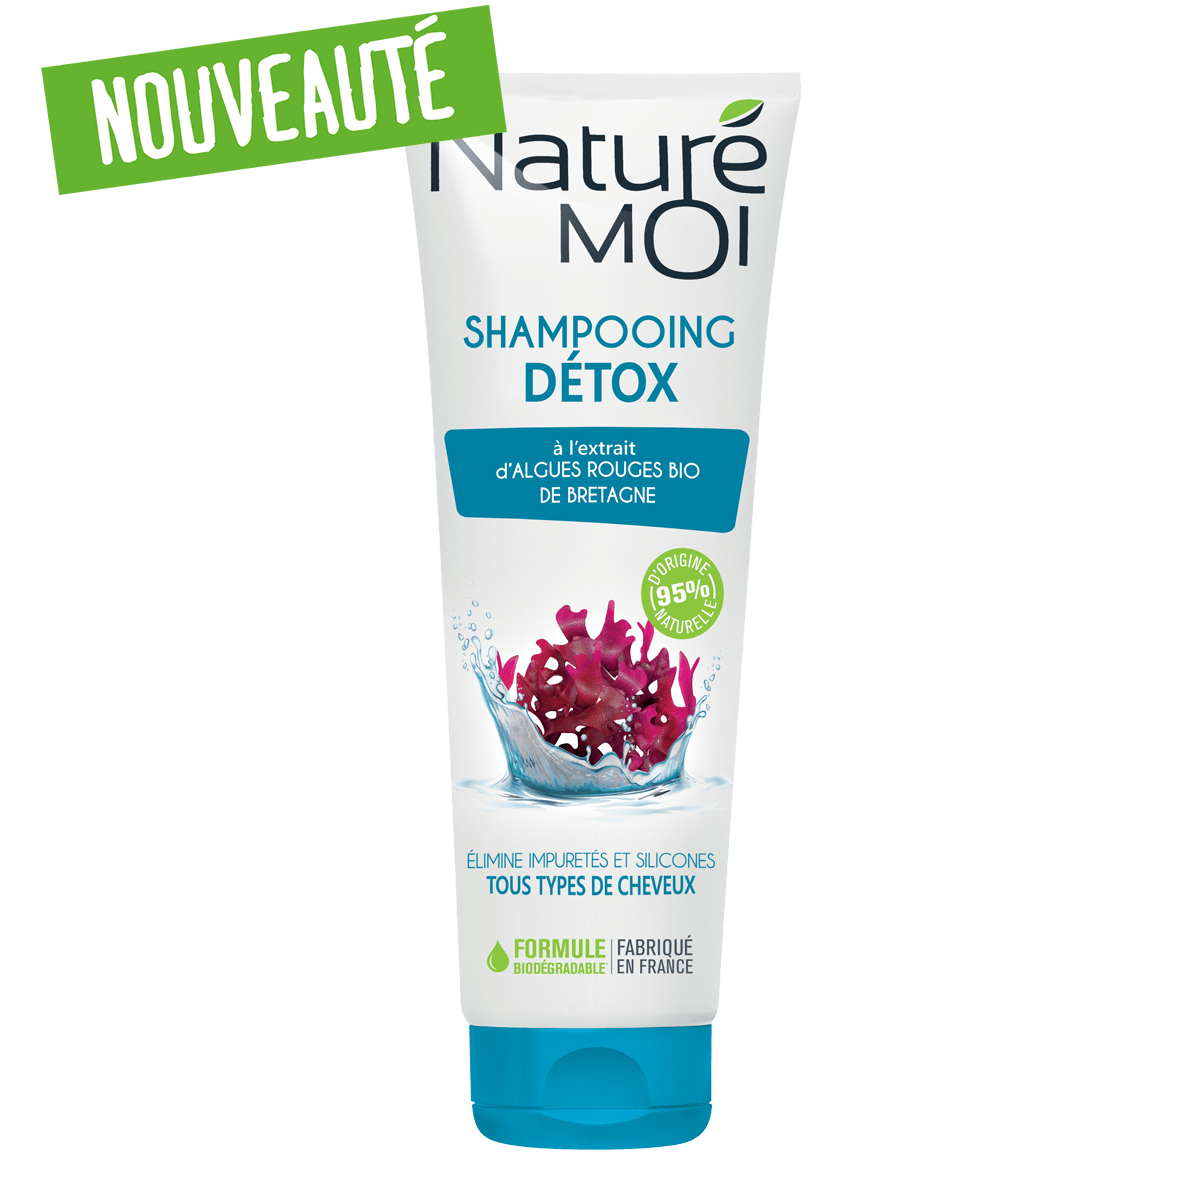 Image Shampooing Détox